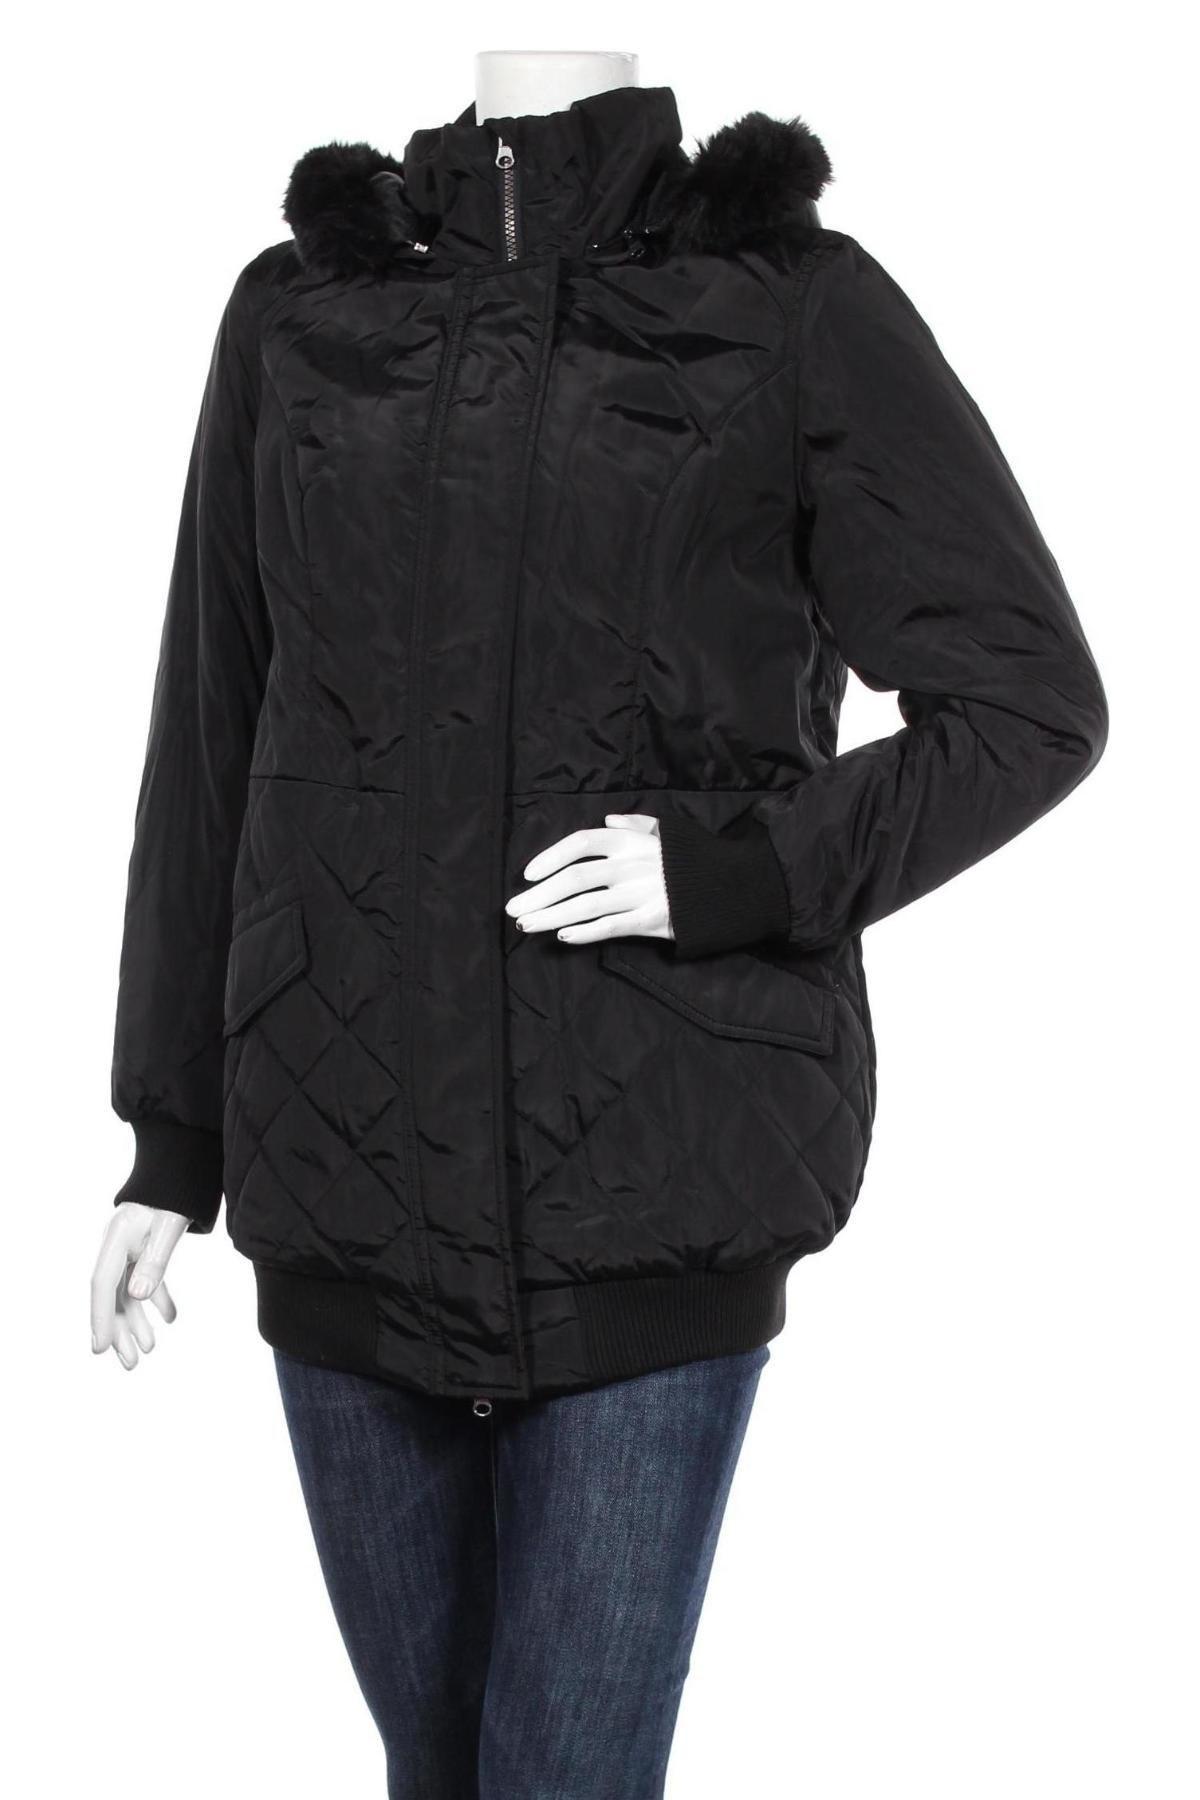 Дамско яке Body Flirt, Размер XL, Цвят Черен, Полиестер, Цена 84,00лв.